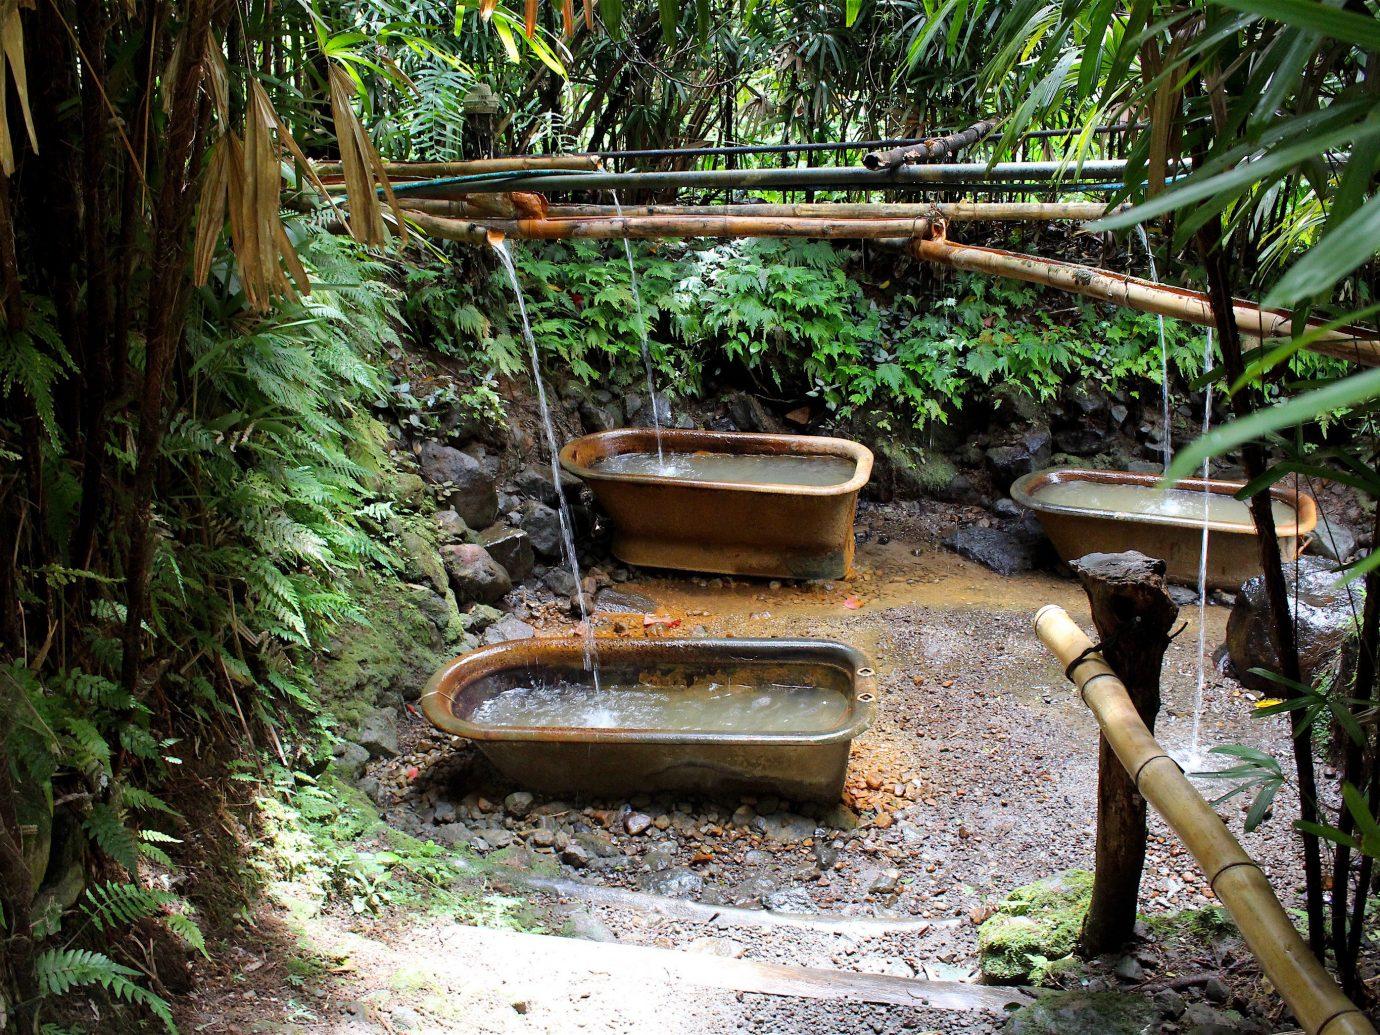 Trip Ideas tree outdoor ground habitat natural environment plant Forest rainforest Jungle woodland Garden stream old bushes dirt stone